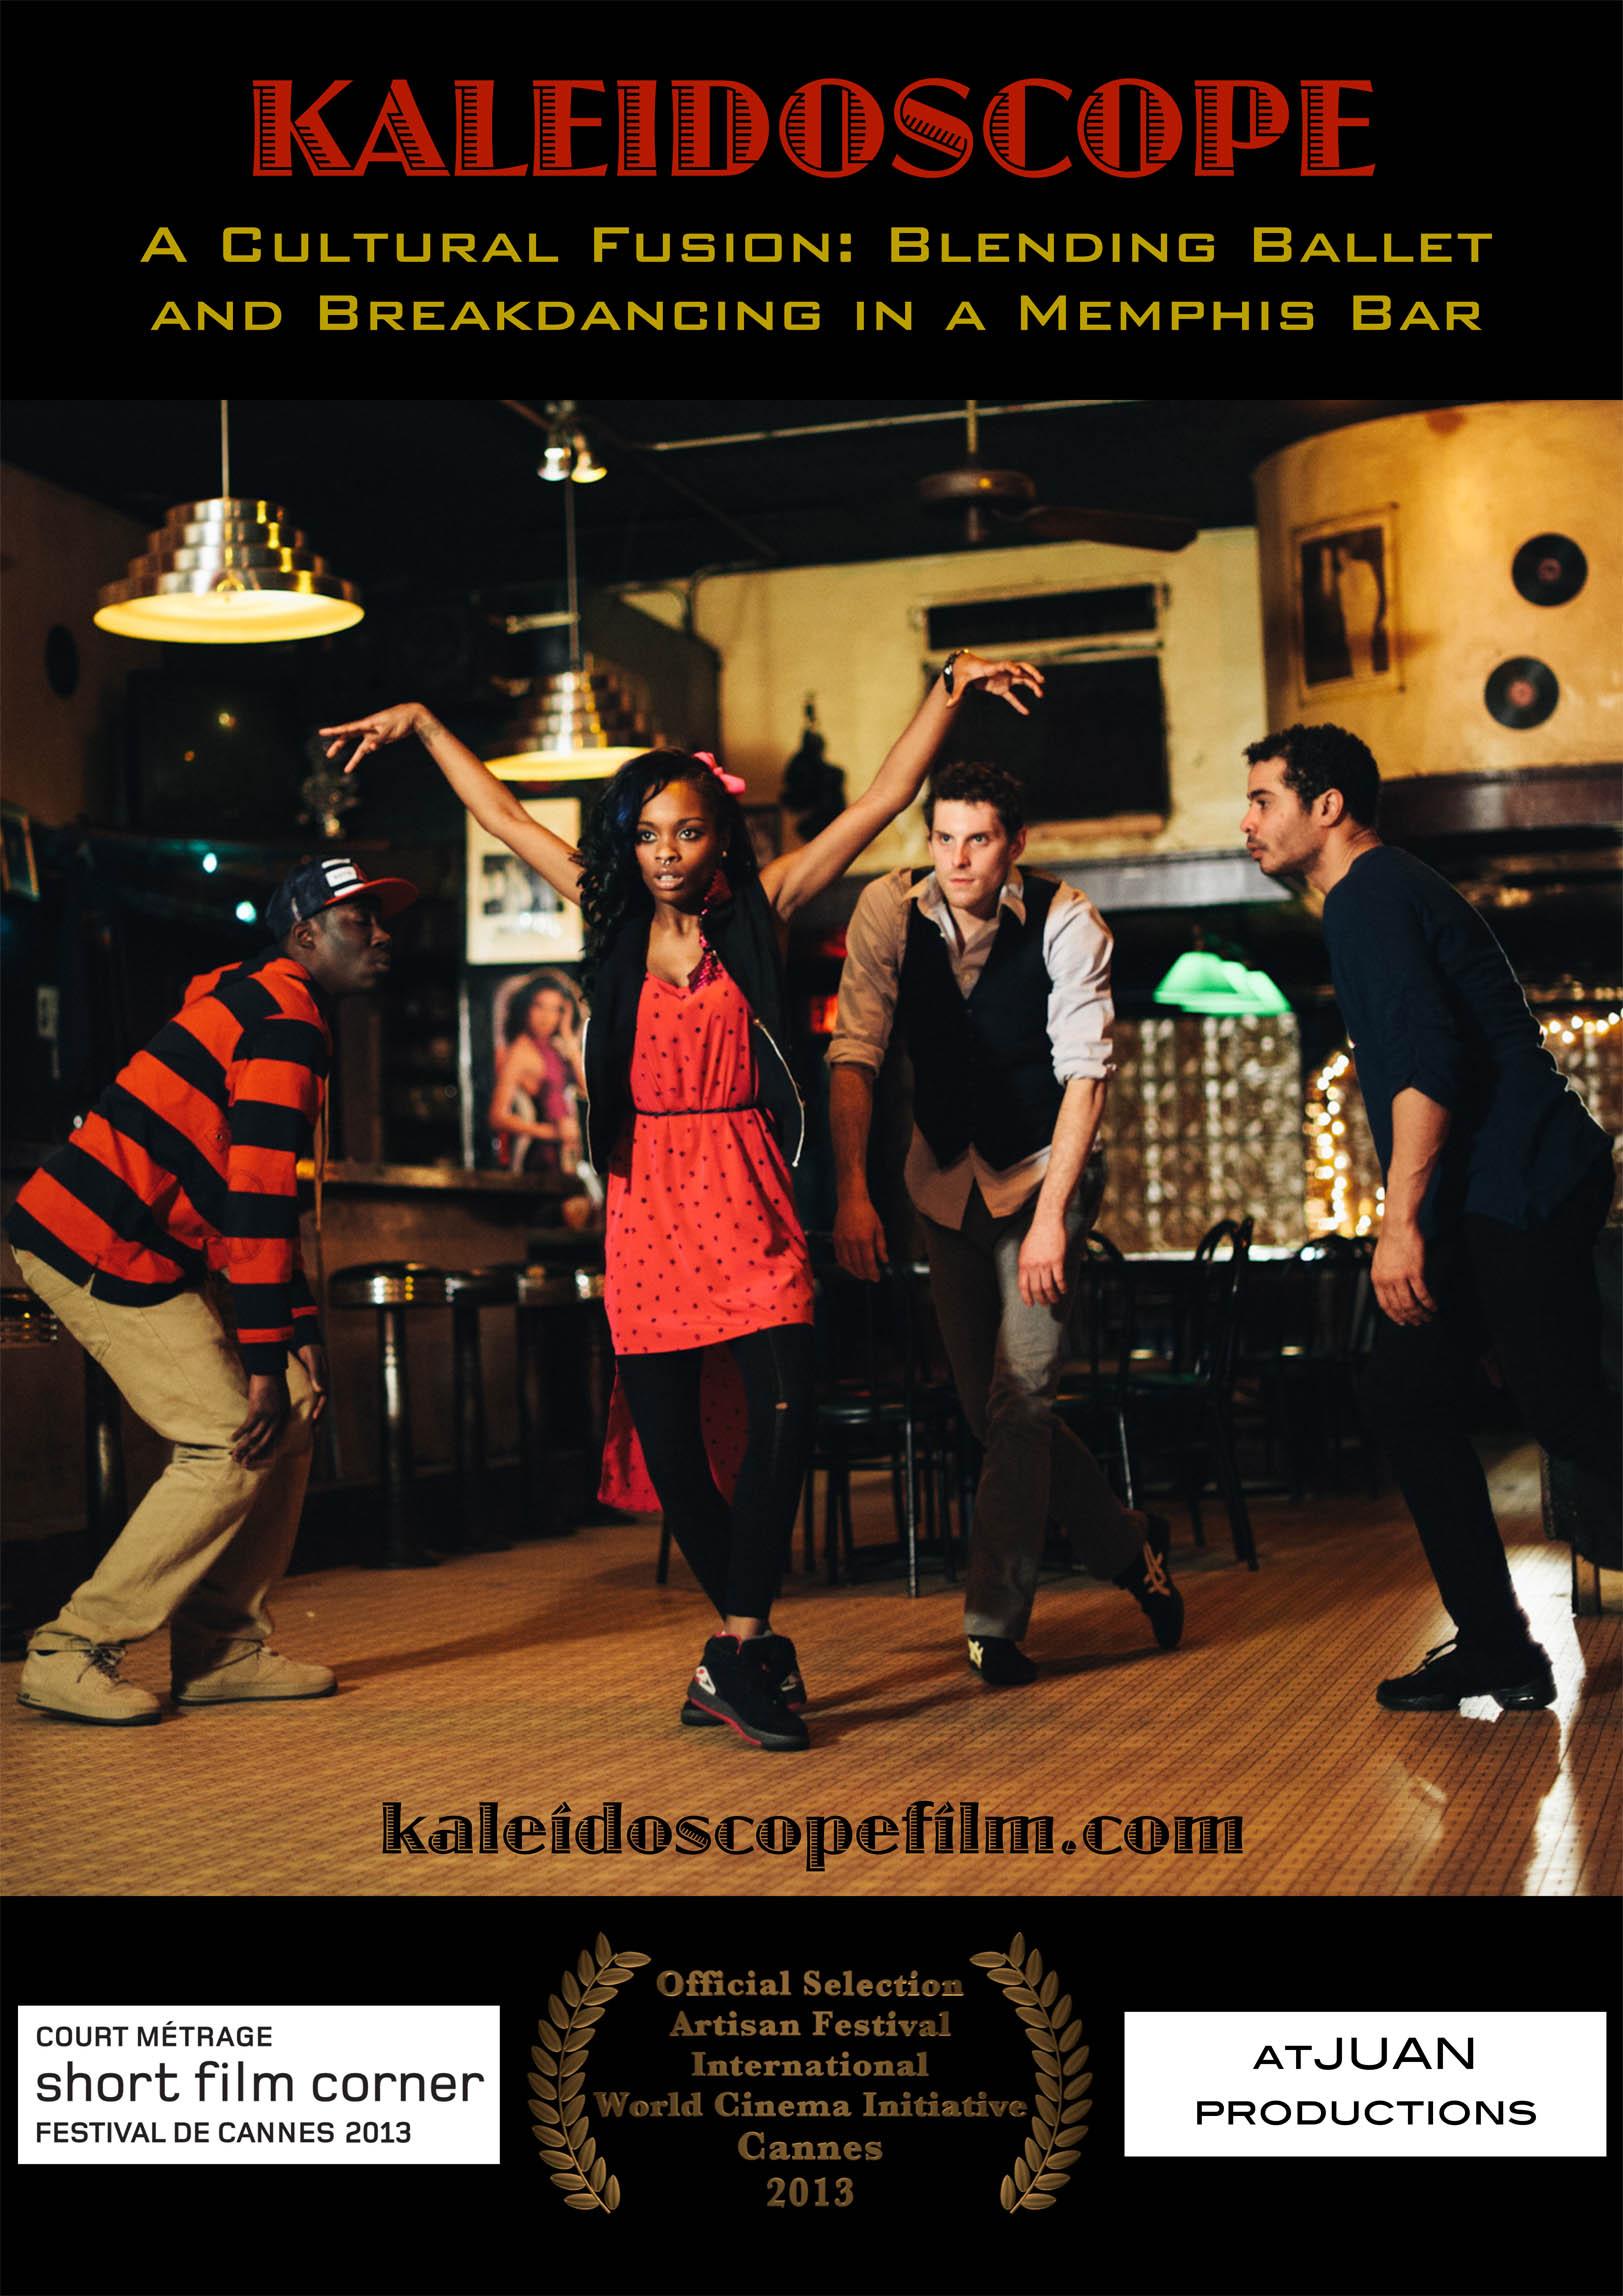 Kaleidoscope     Best Performing Arts Film     Cannes World Cinema Initiative